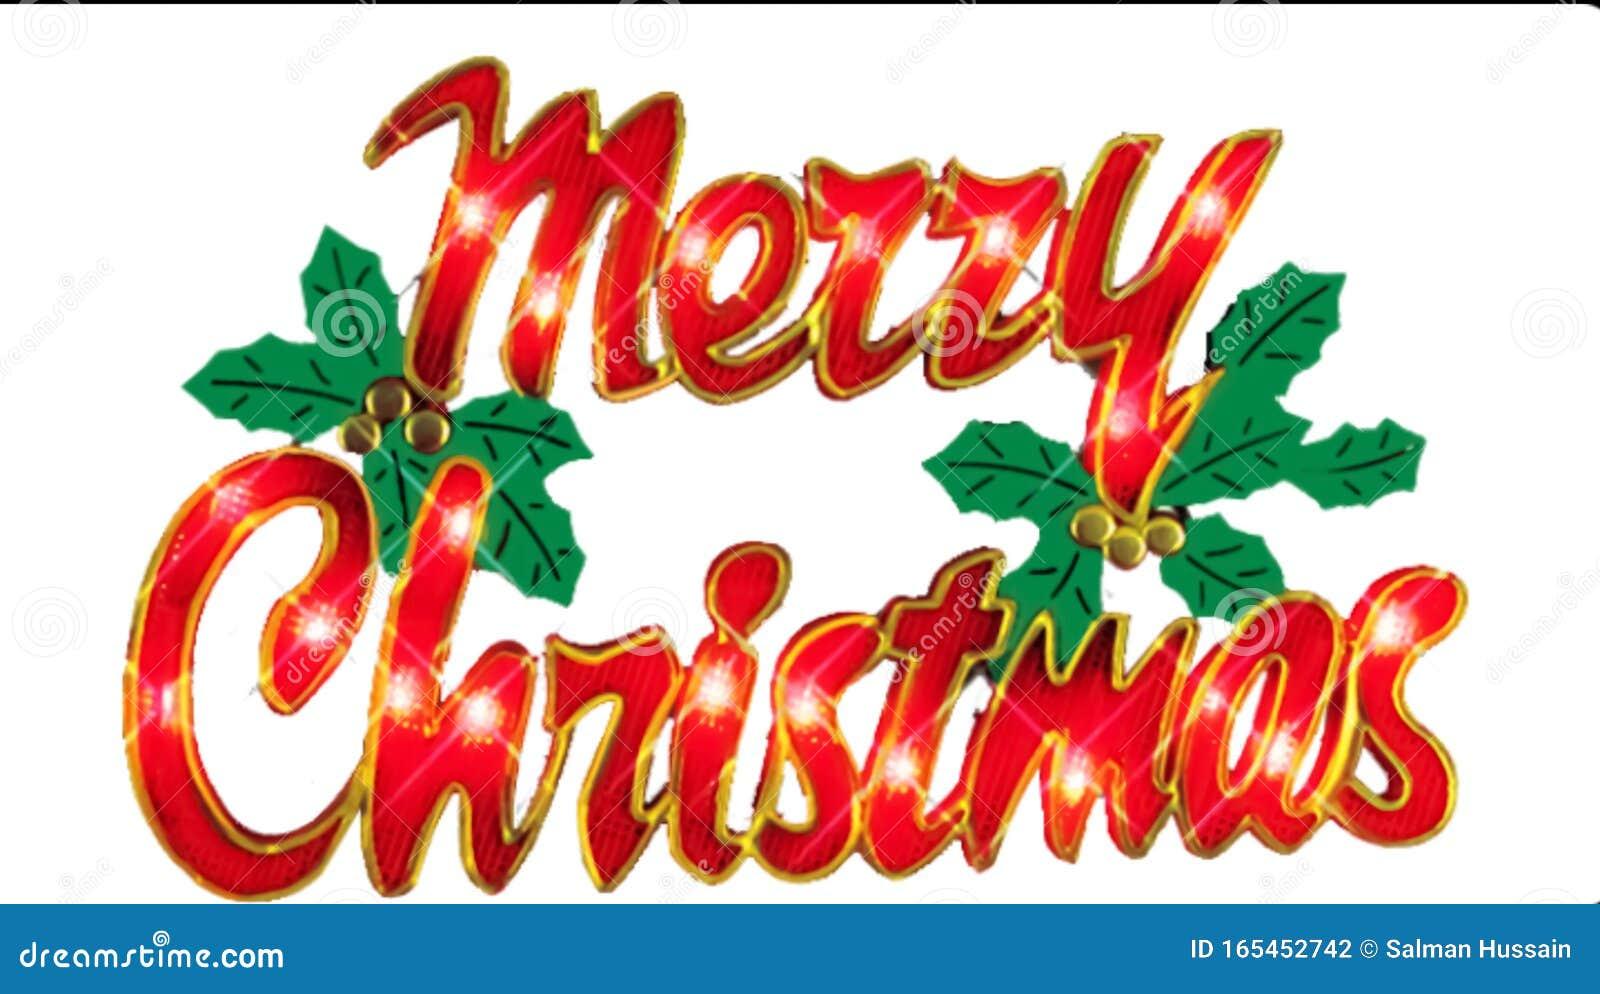 Merry Christmas written poster of 2019